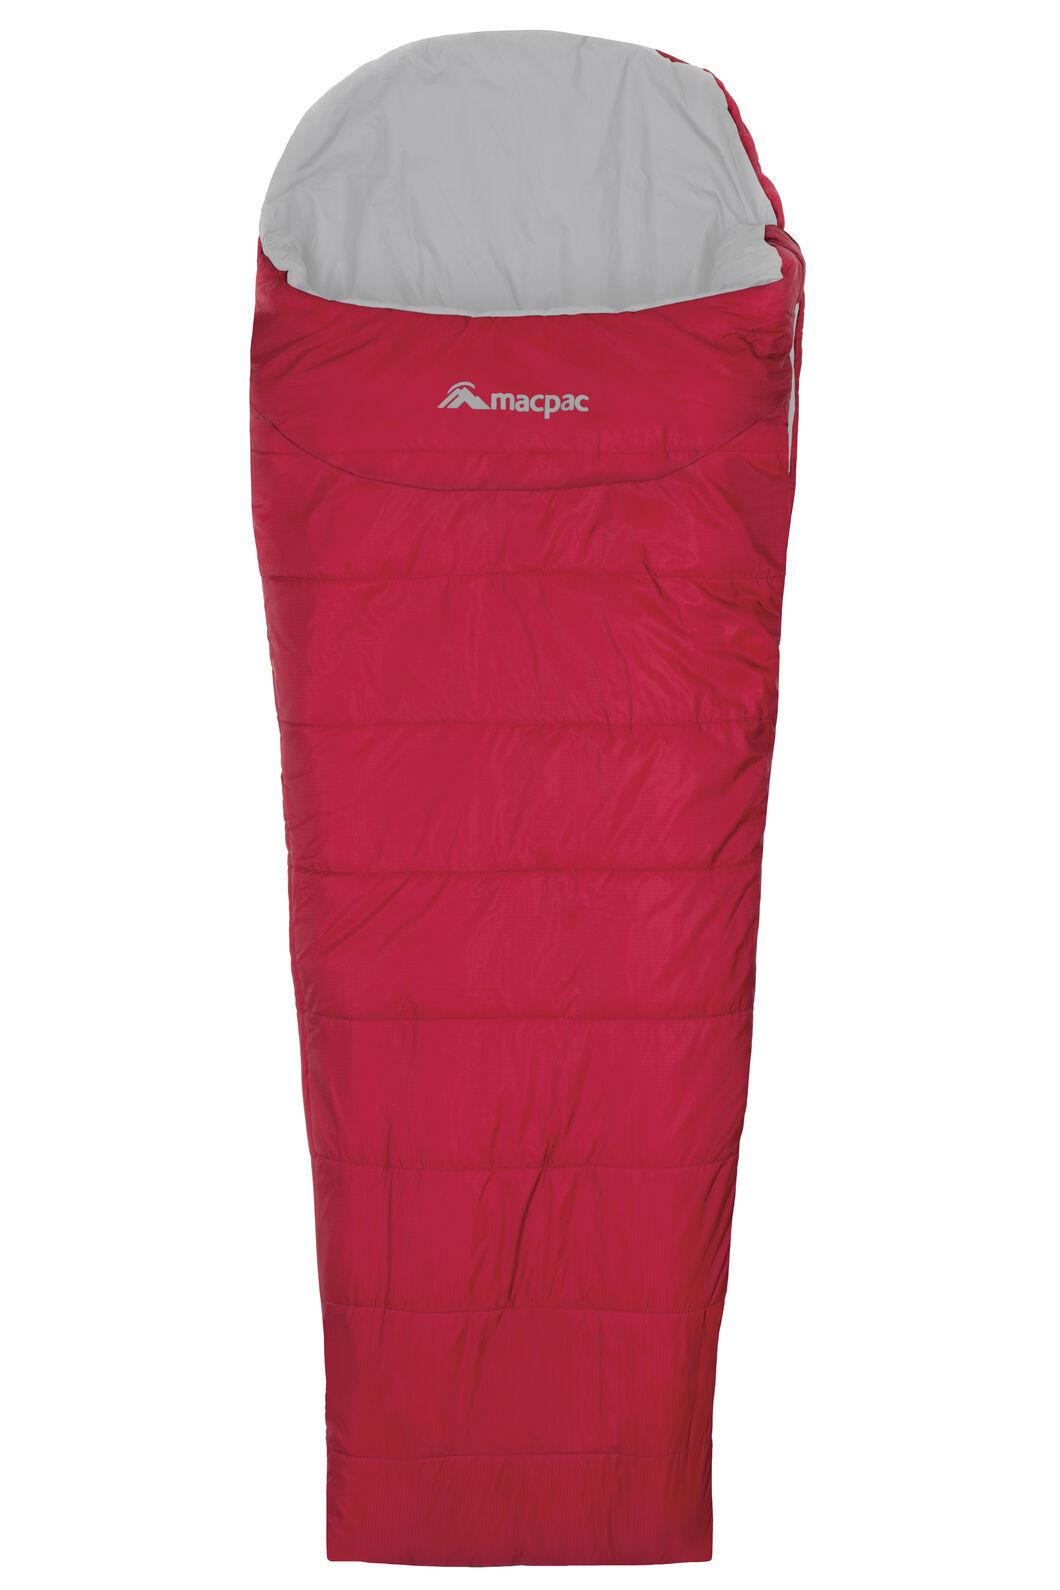 Macpac Roam Synthetic 350 Sleeping Bag - Standard 0fa1fd3db959b